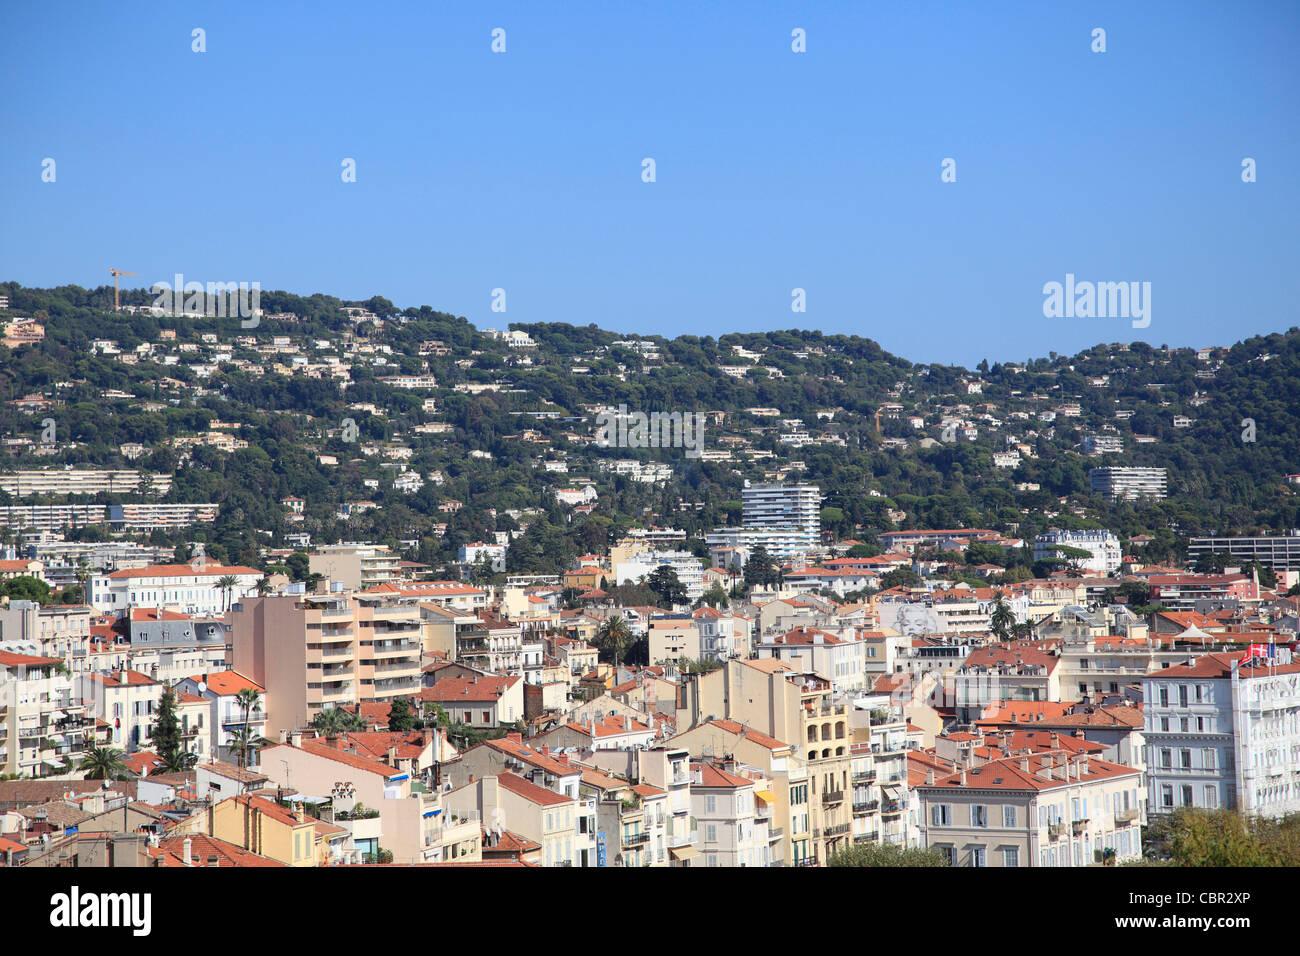 Cannes, Cote d'Azur, Alpes-Maritimes, Provence, France, Europe - Stock Image